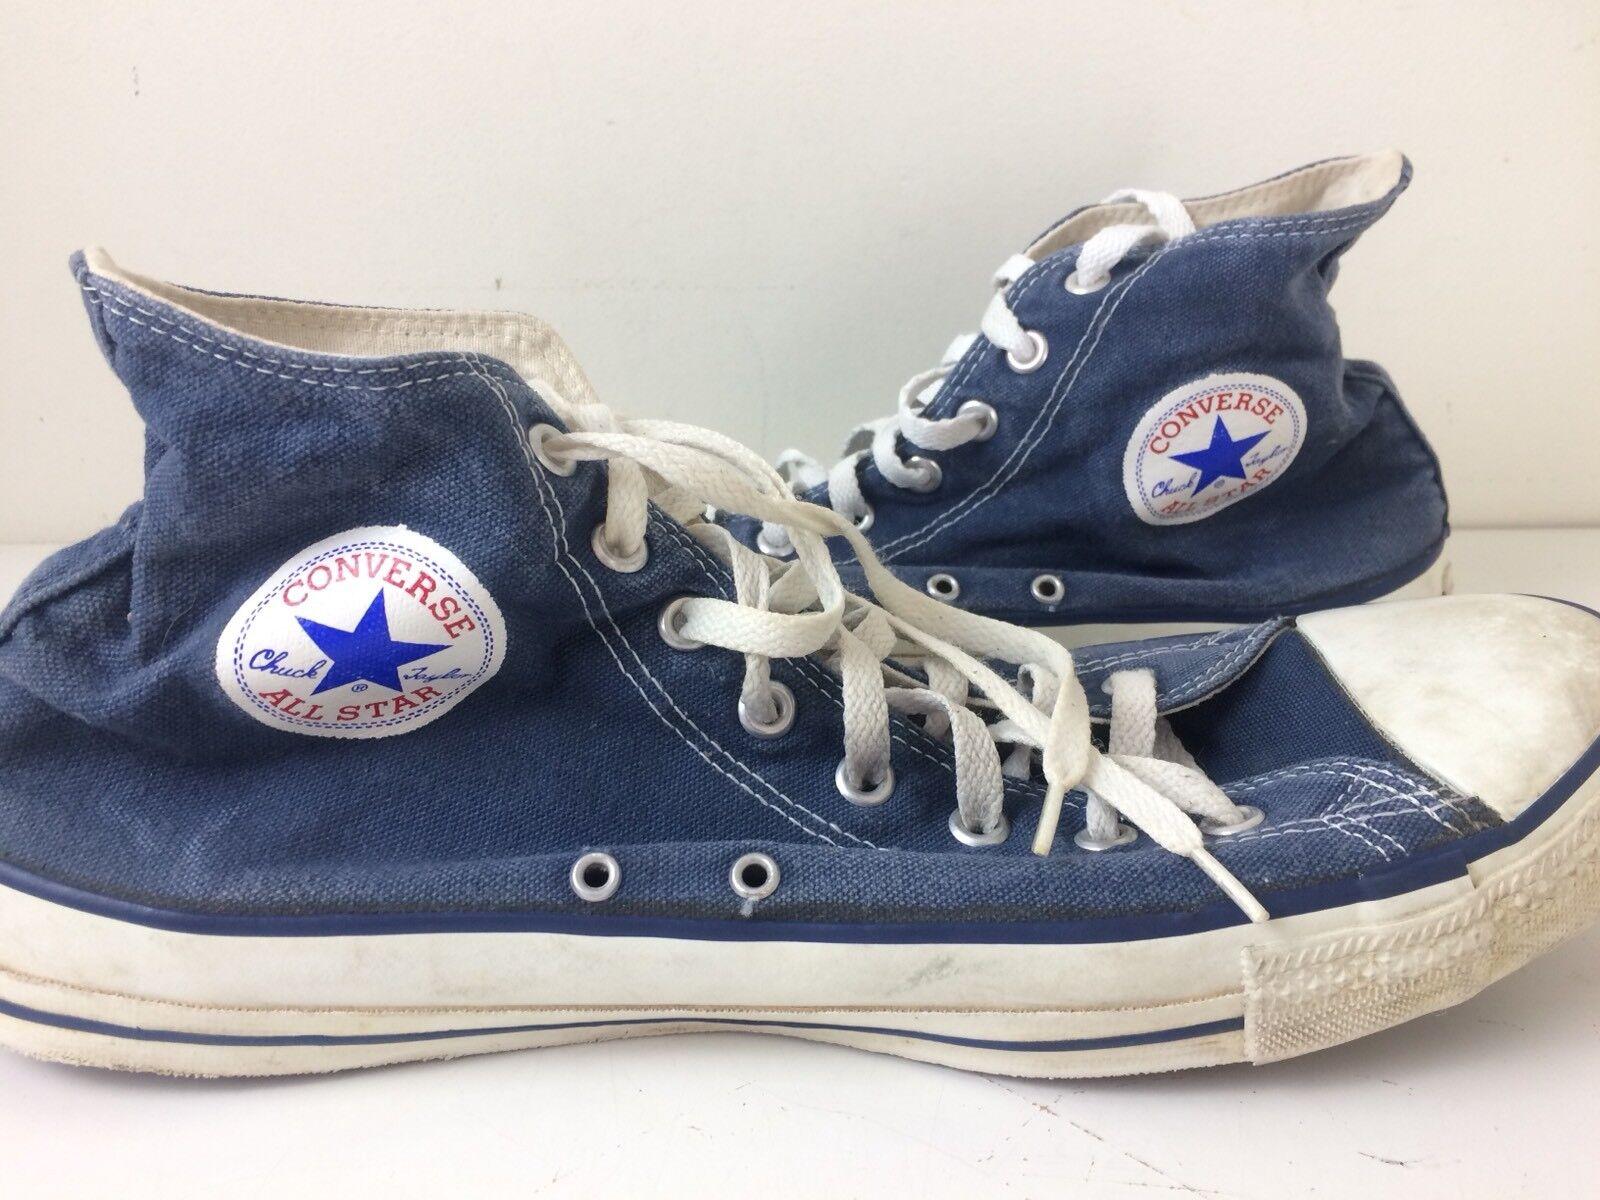 Converse chuck taylor denim all - star - männer blaue denim taylor - bequem 994d45